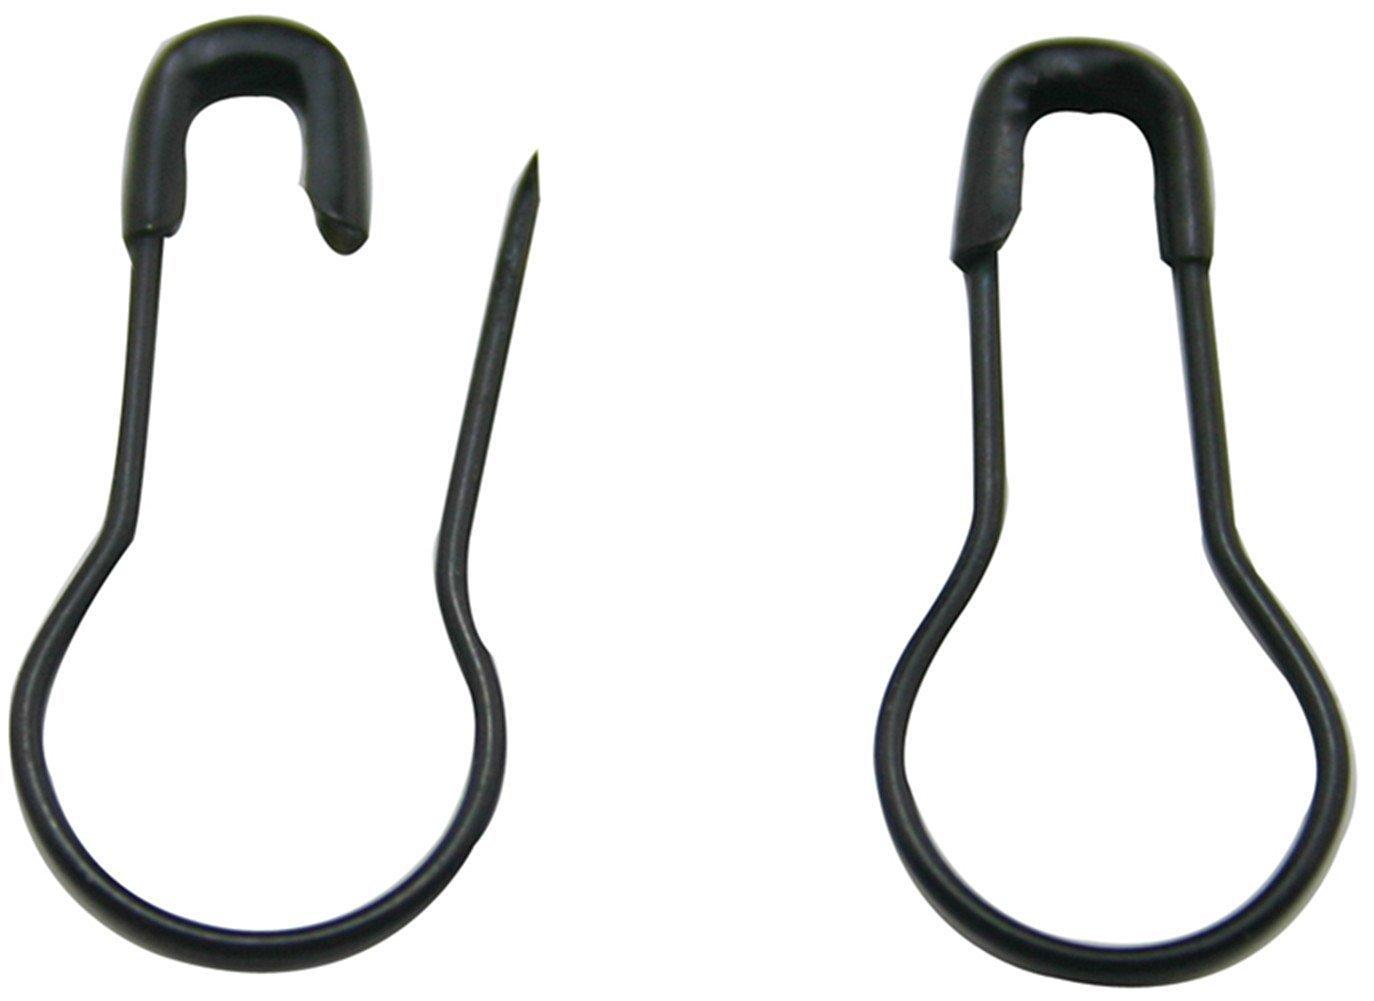 black 300 Pcs Calabash Shape 0.8 Metal Safety Pins Bulb Pin Bead Needle Pins Sewing Clothing Tag Pins DIY Home Handcraft Accessories